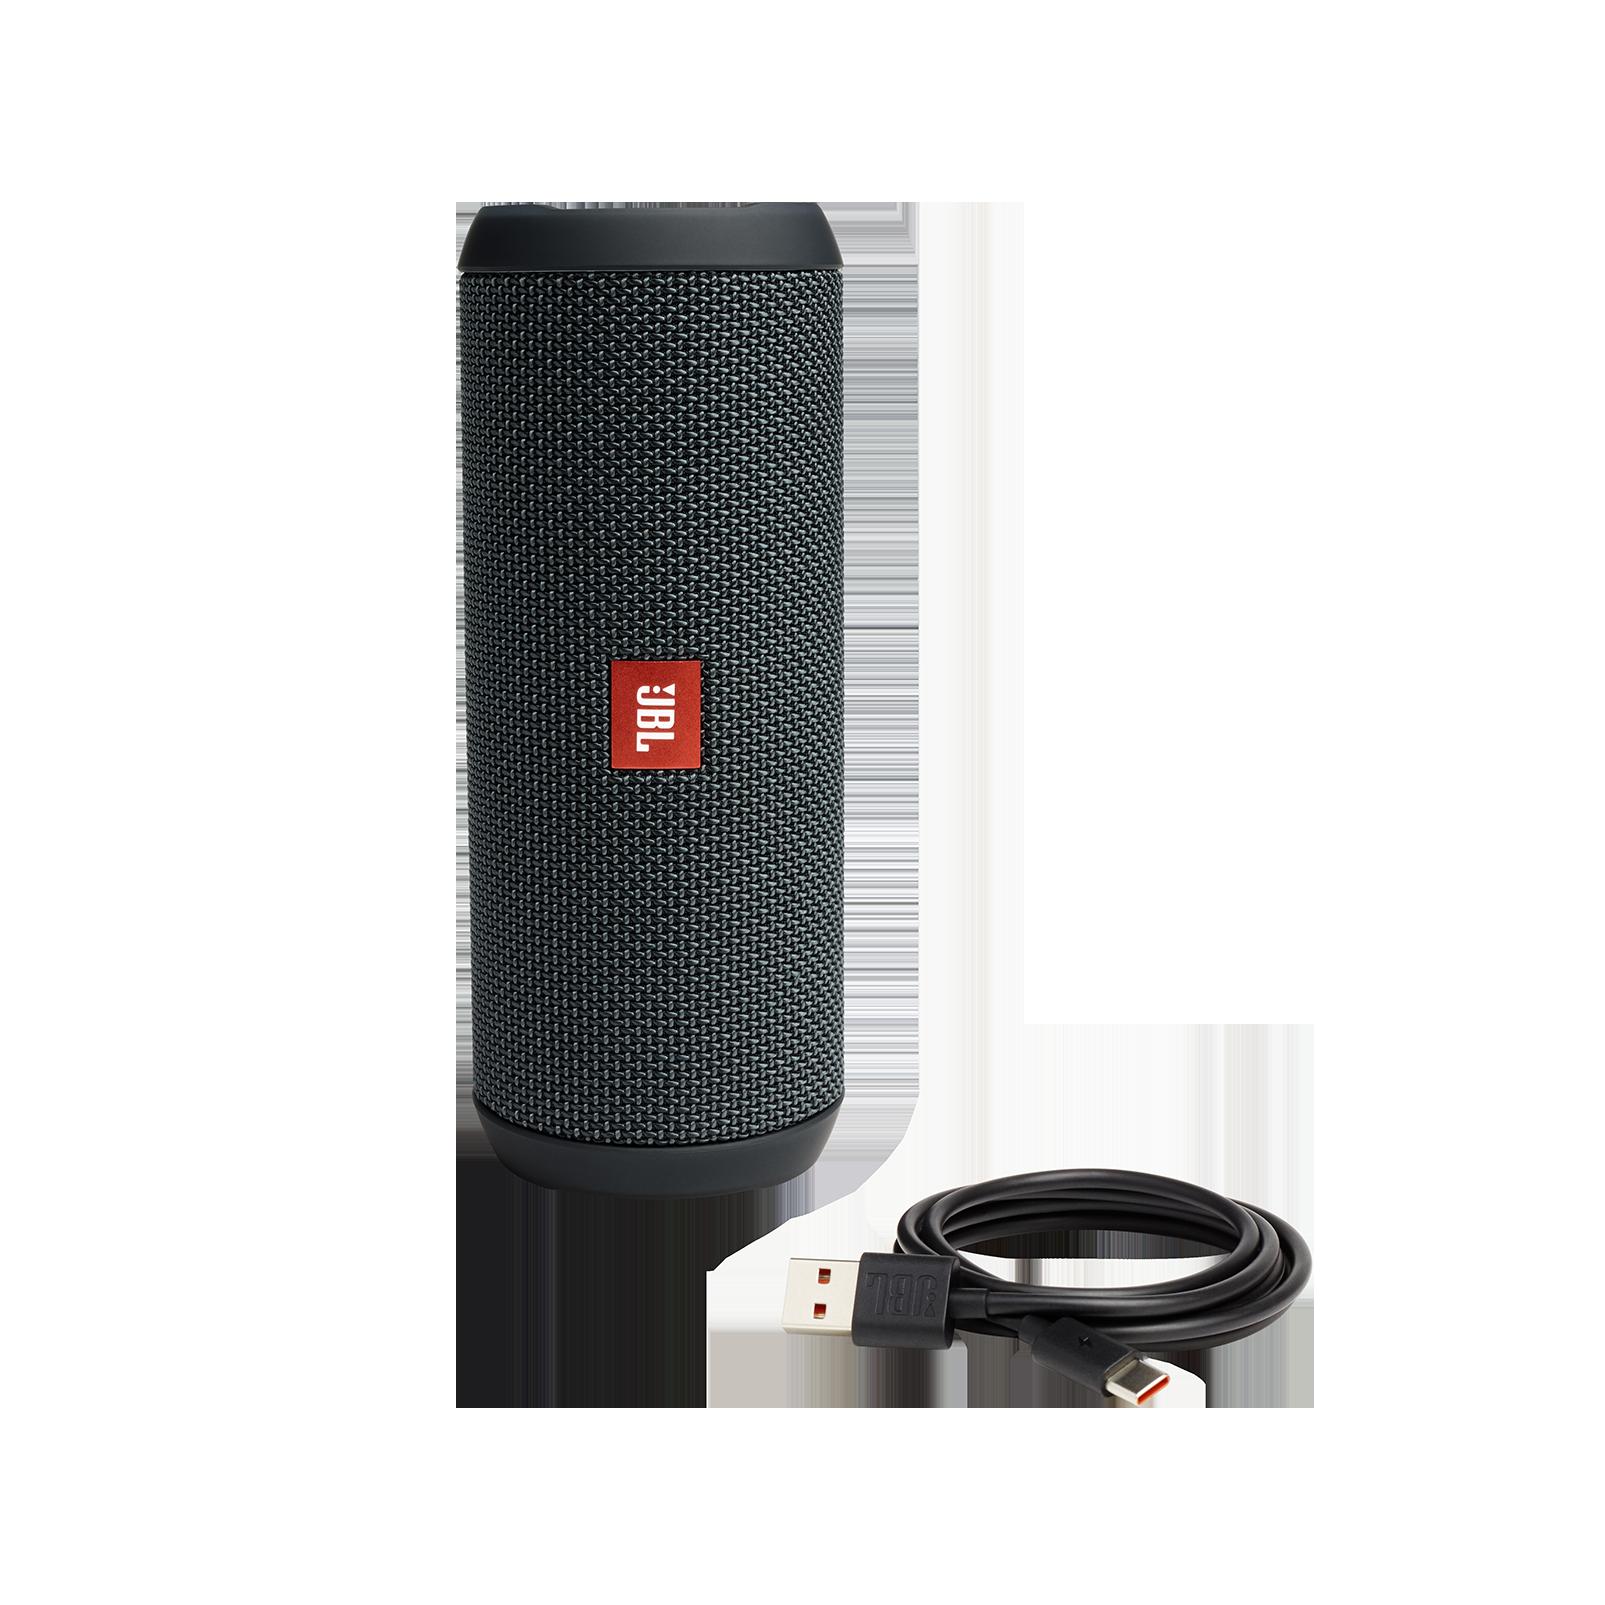 JBL Flip Essential - Gun Metal - Portable Bluetooth® speaker - Detailshot 1